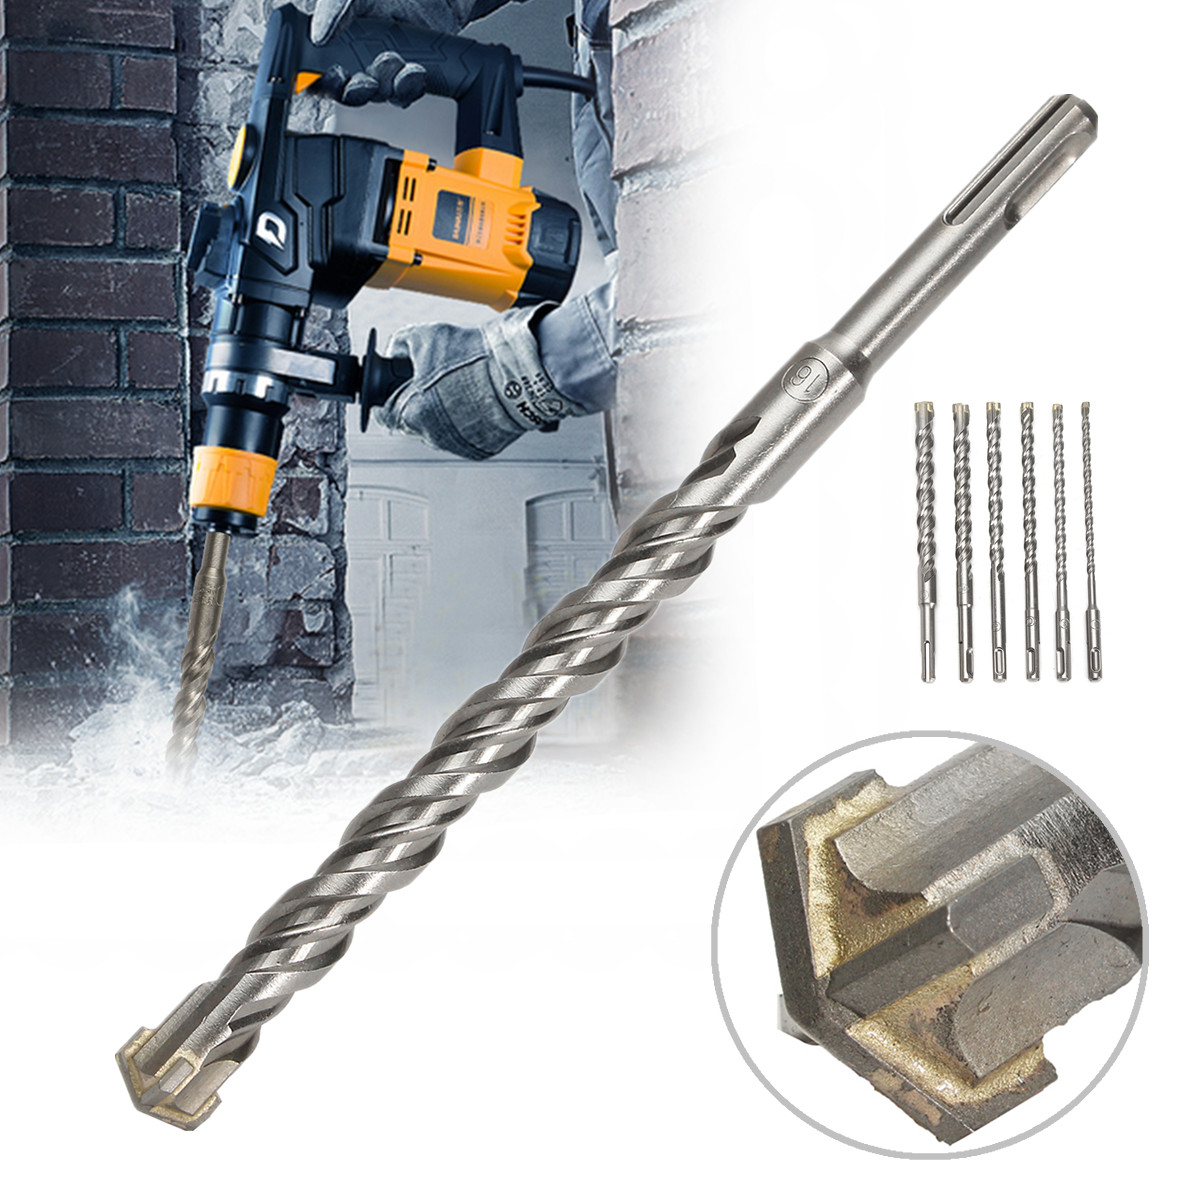 Concrete Tungsten Carbide Tip 210mm SDS Plus Crosshead Drill Bits Carbide Twin Spiral Drilling Efficiency High Precision Durable цена